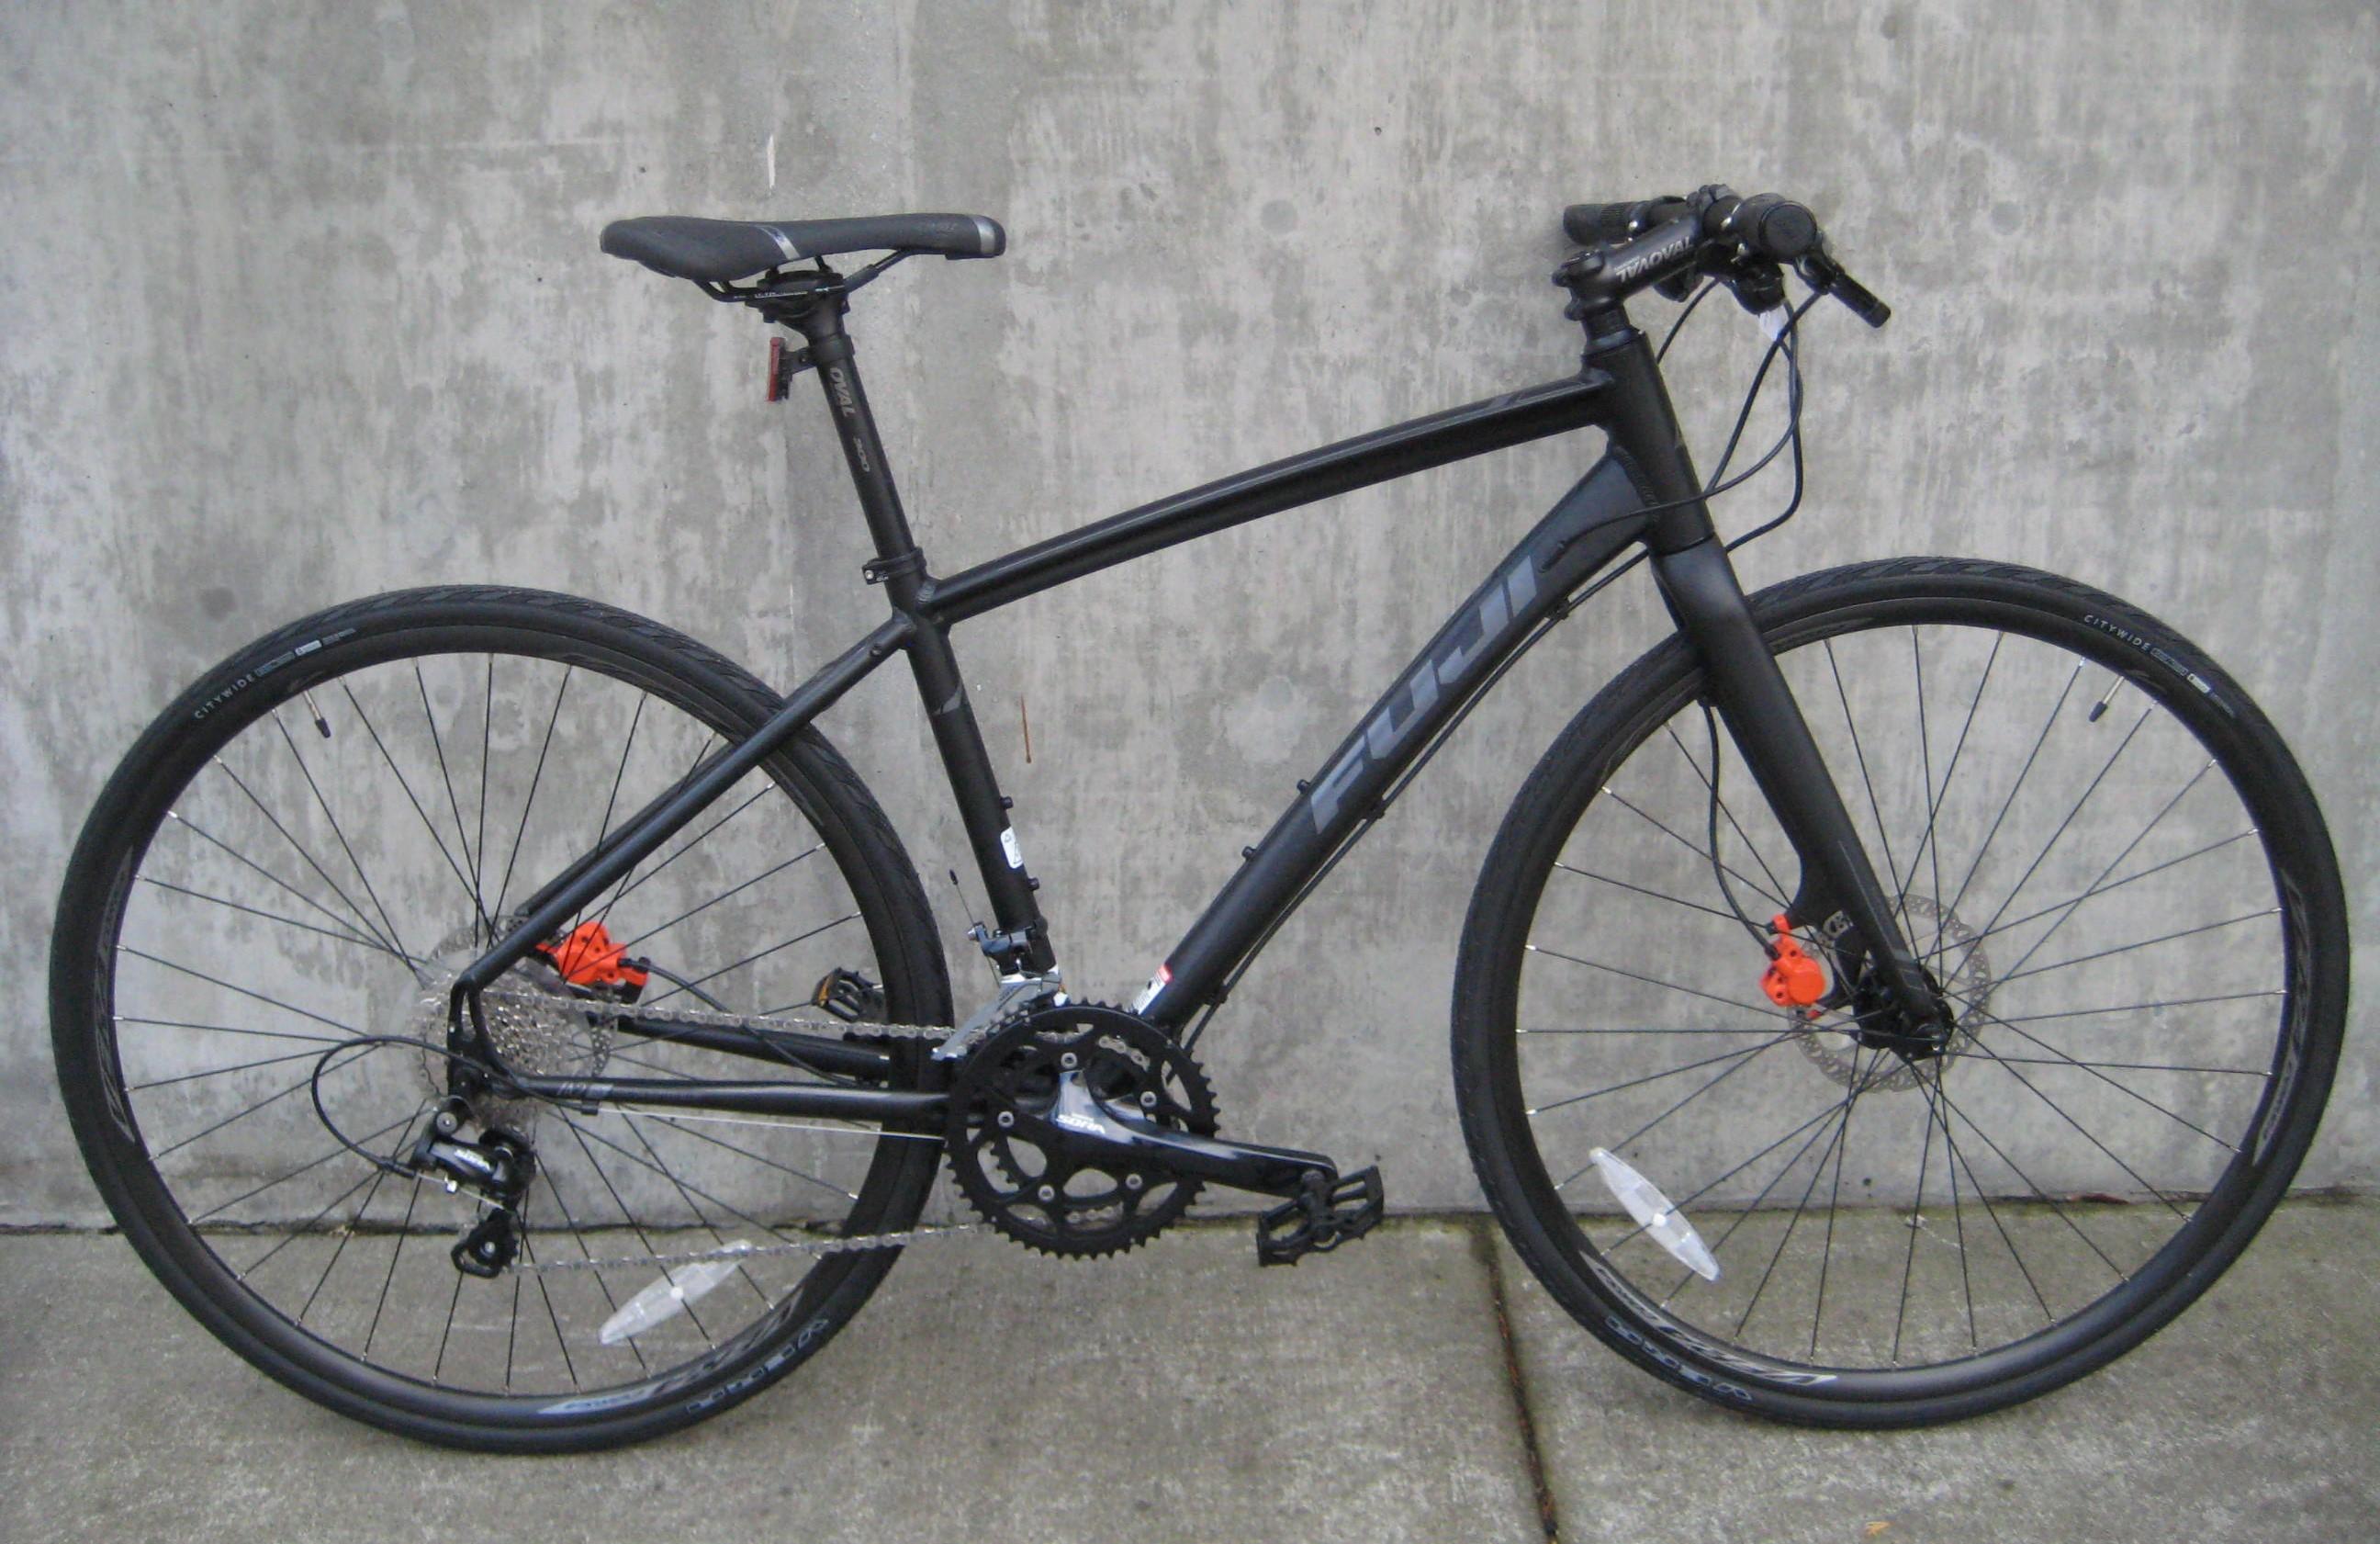 Fuji Hybrid Bikes For Sale At Classic Cycle Bainbridge Island